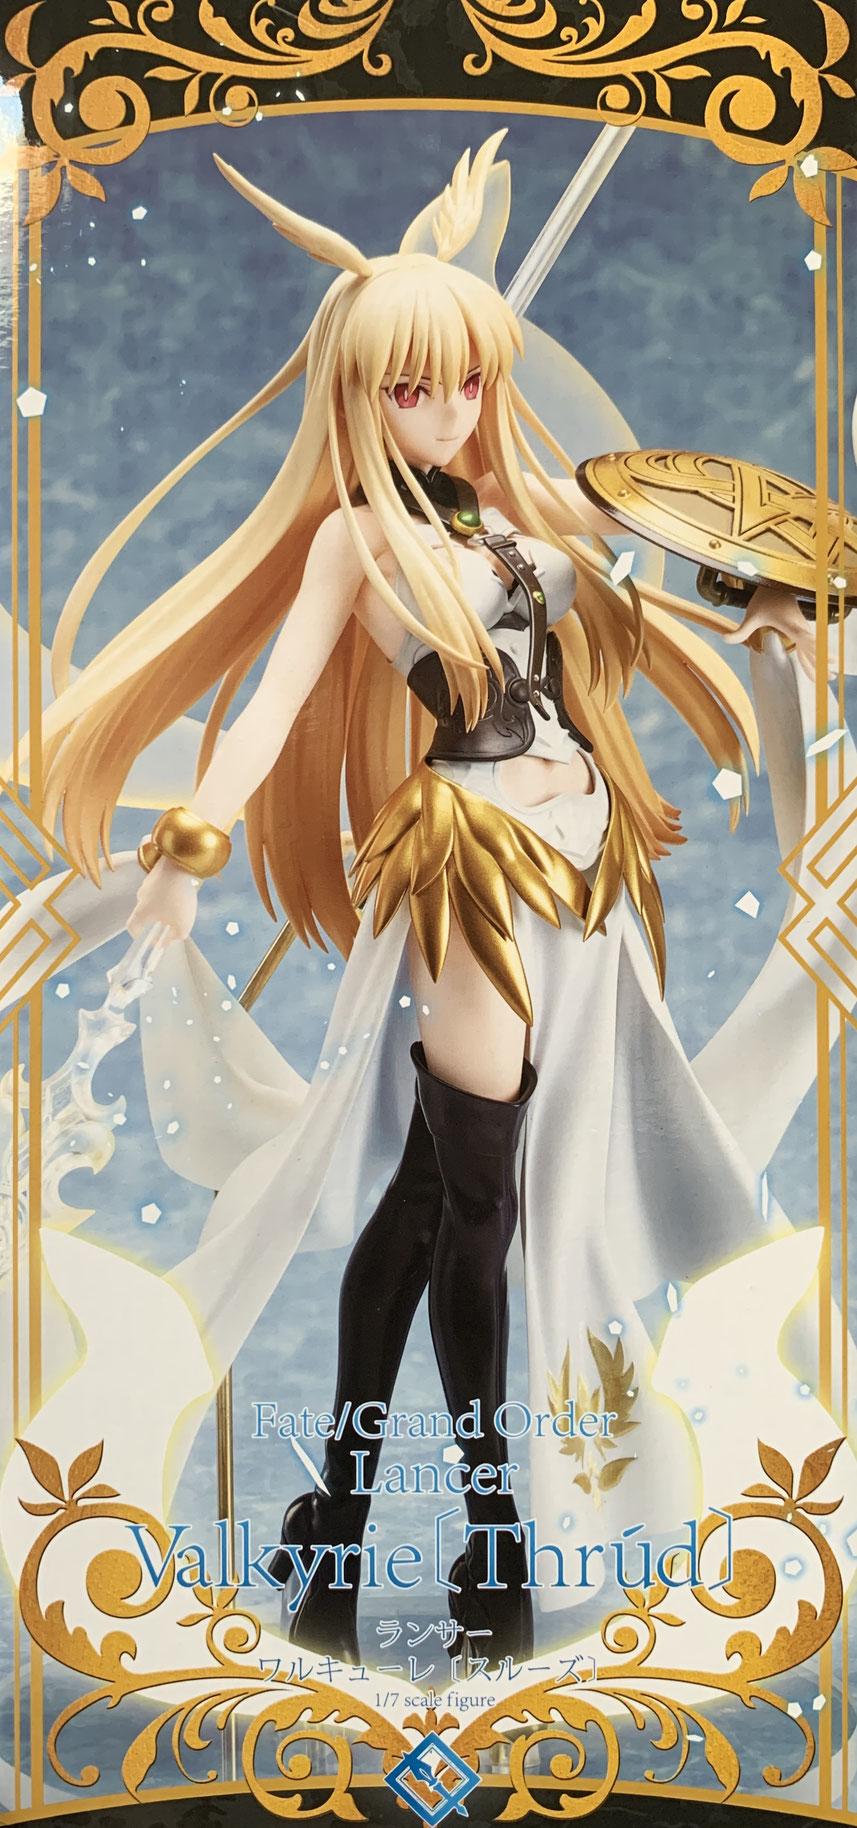 Lancer Valkyrie (Thrud) 1/7 Fate/Grand Order Anime Statue 27cm Aniplex